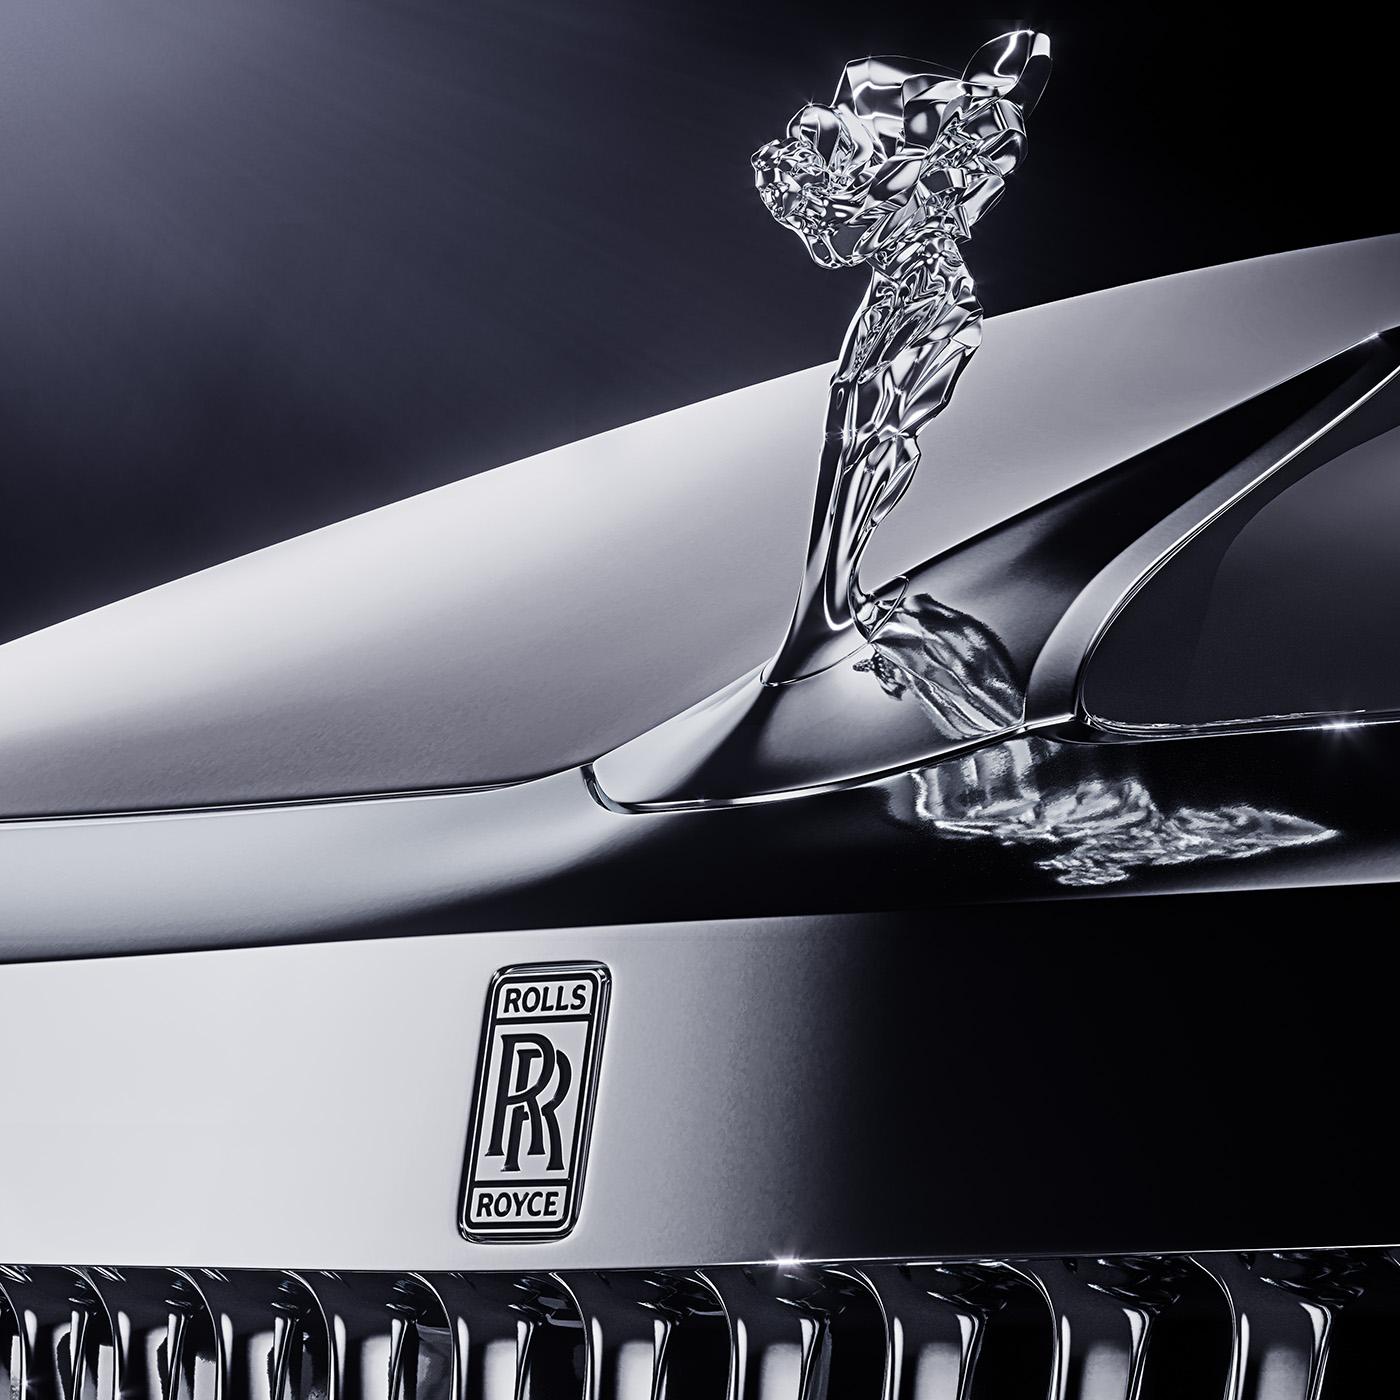 Rolls Royce luxury automotive design 12.jpg